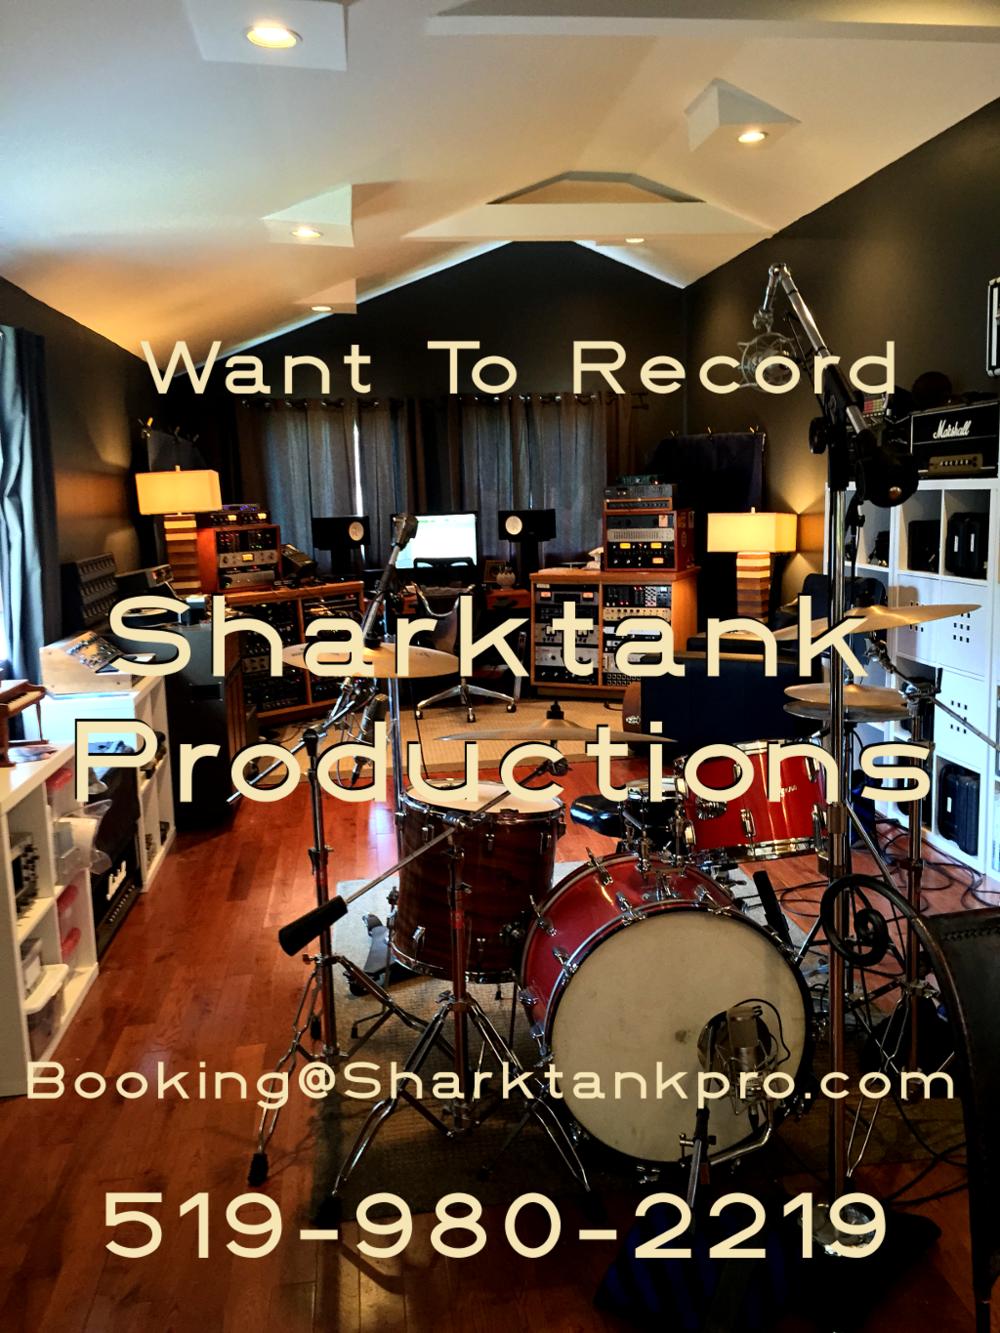 Sharktank Promo